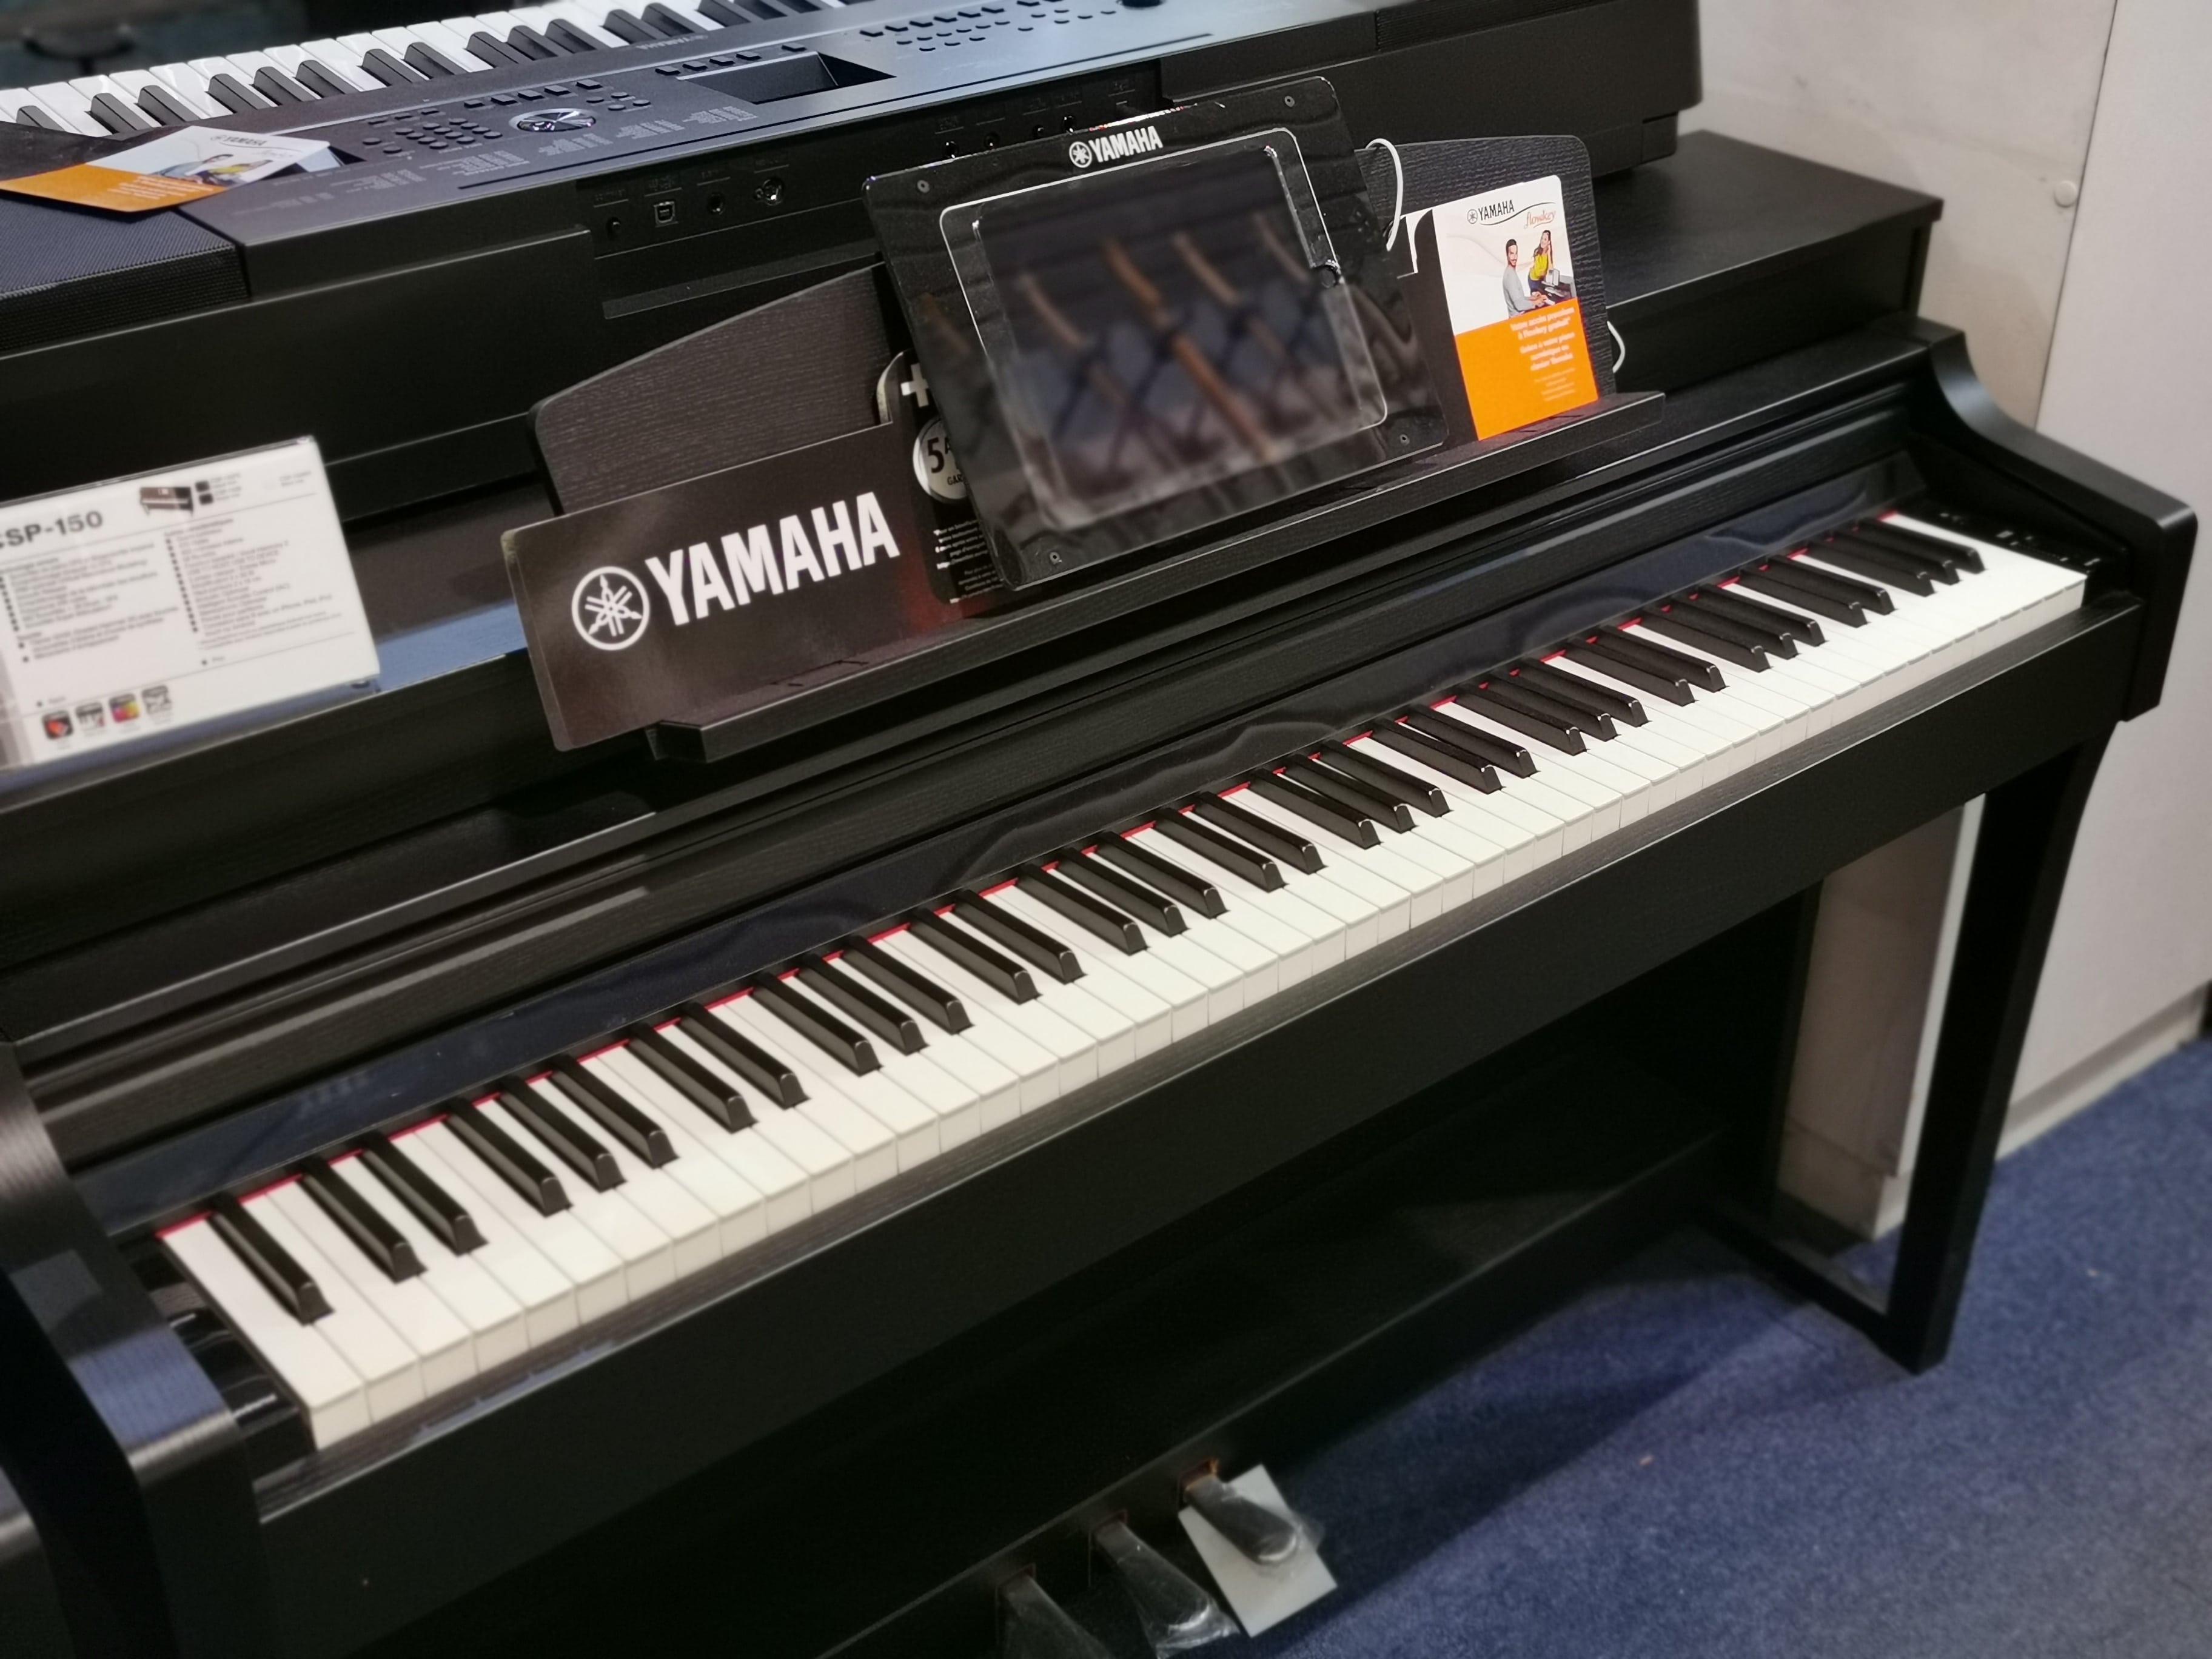 Yamaha CSP 150